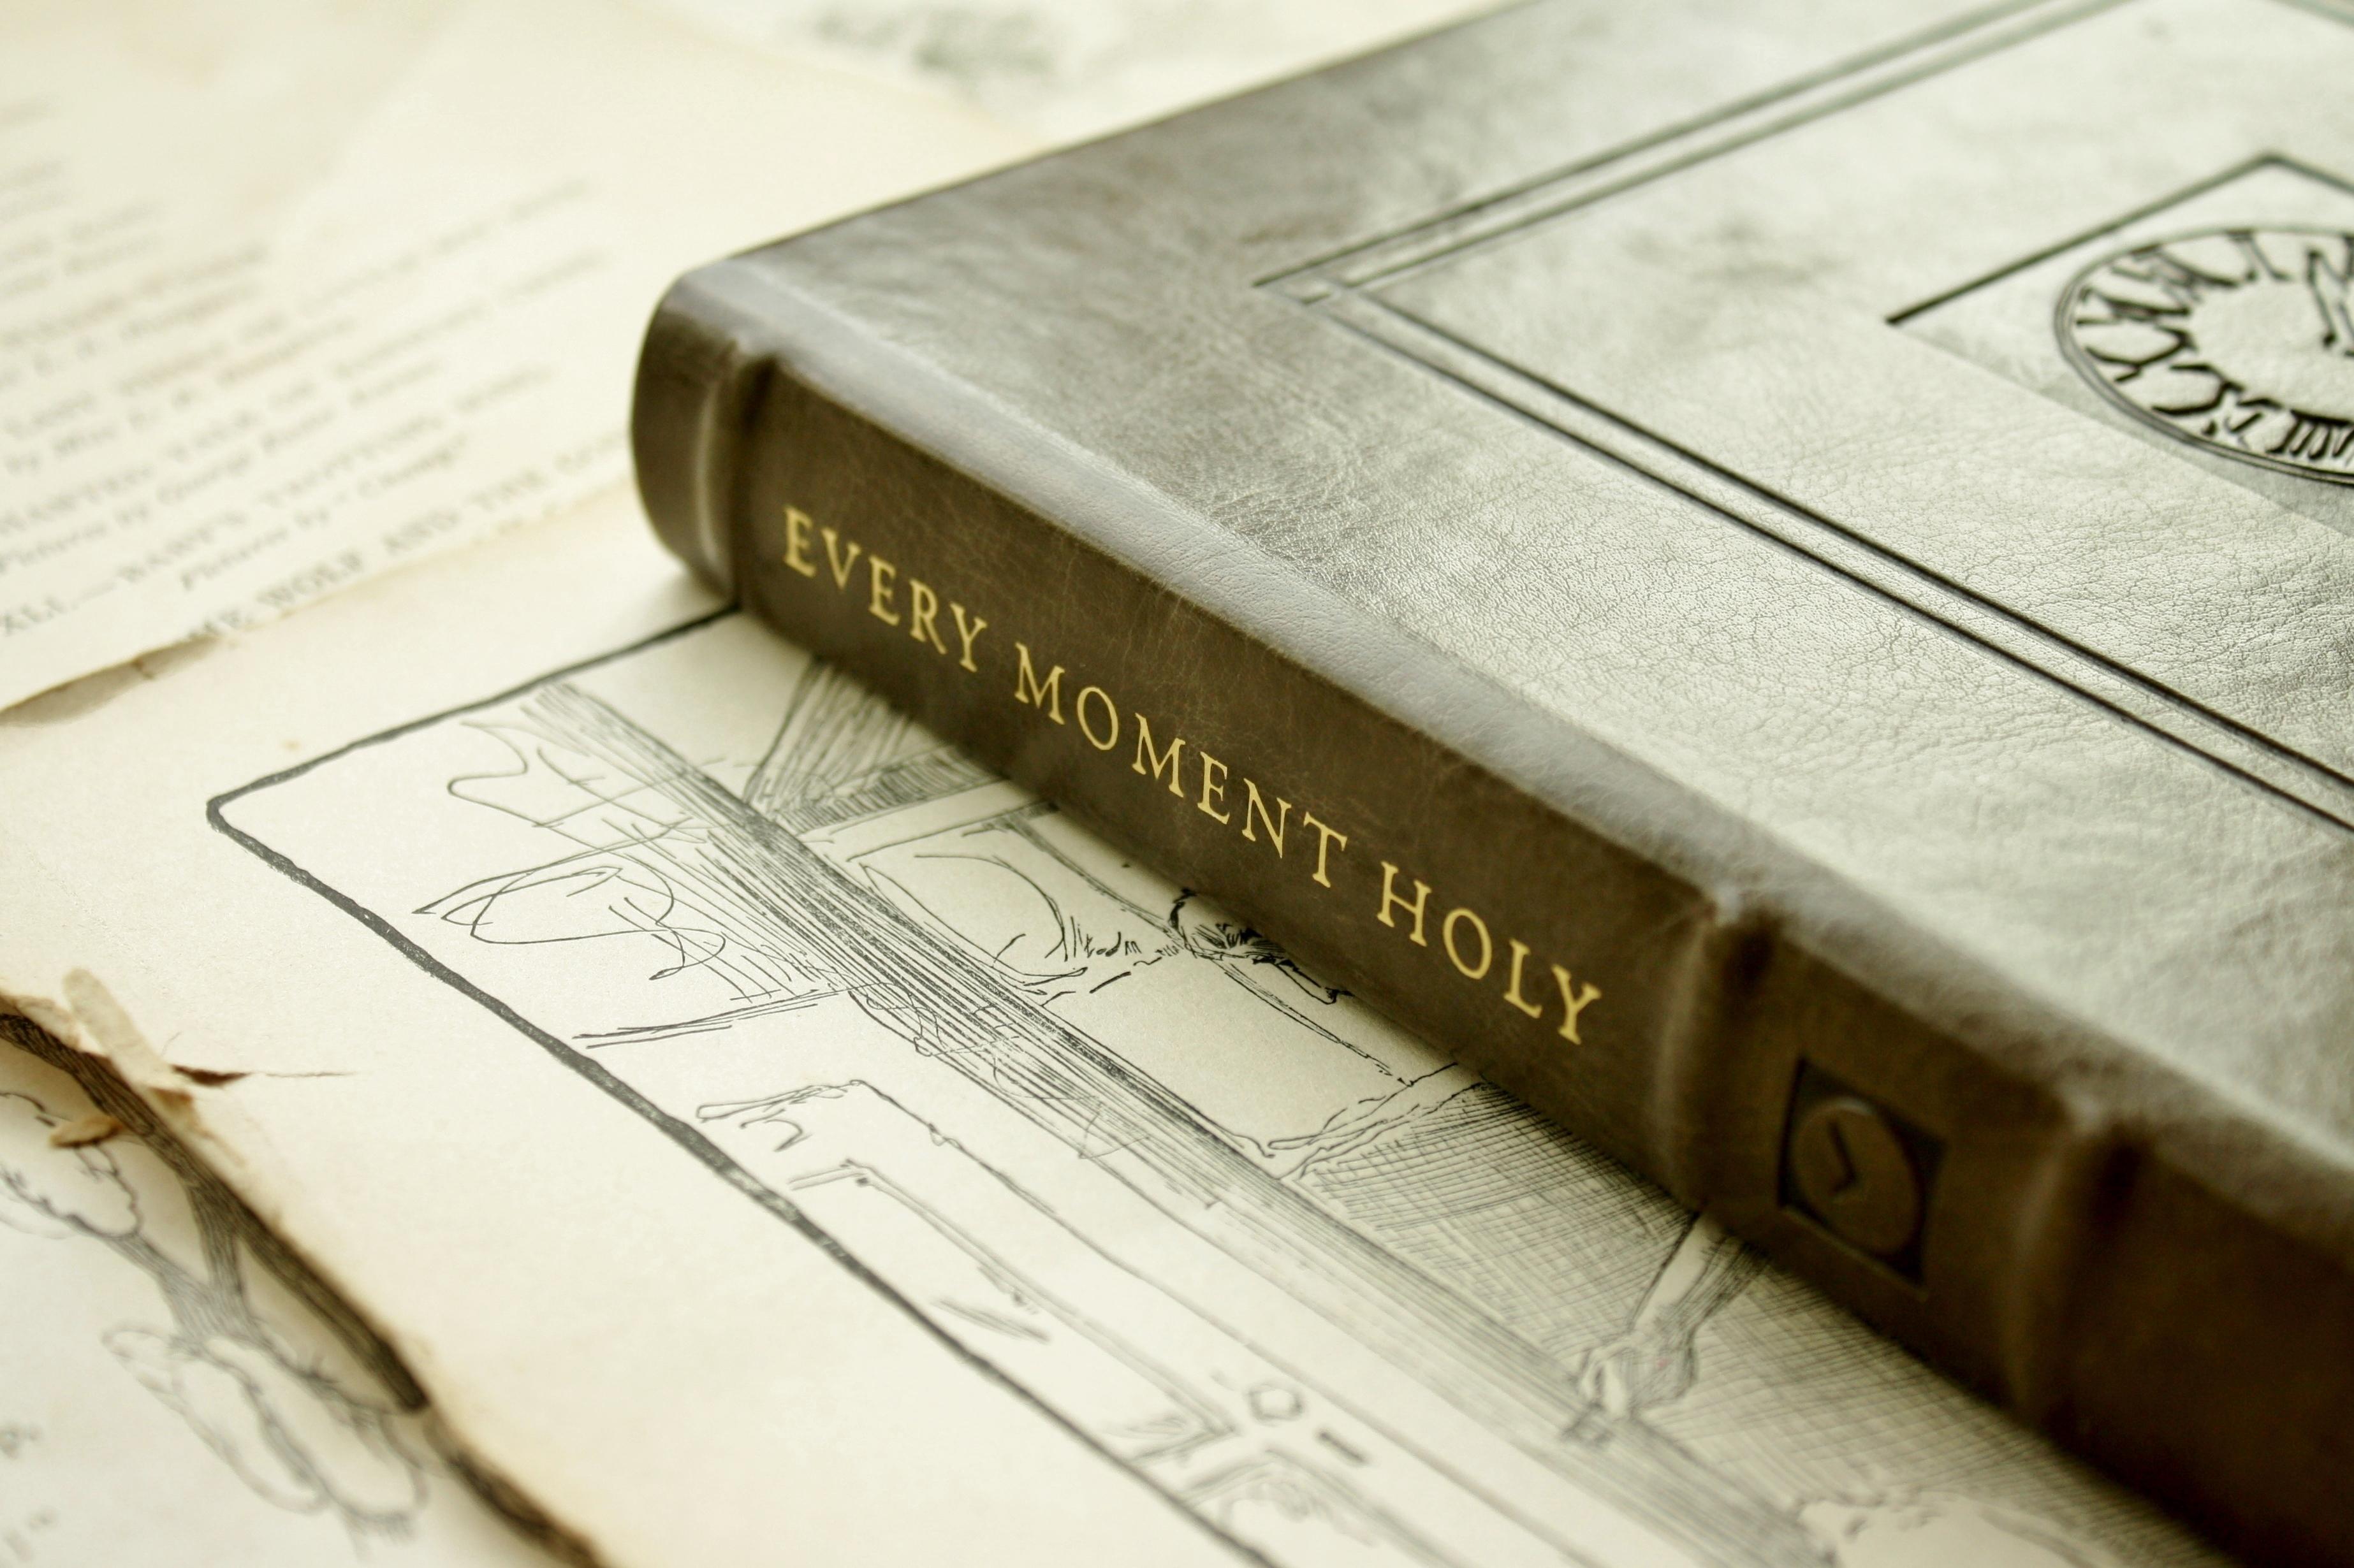 Every Moment Holy | Douglas Kaine McKelvey